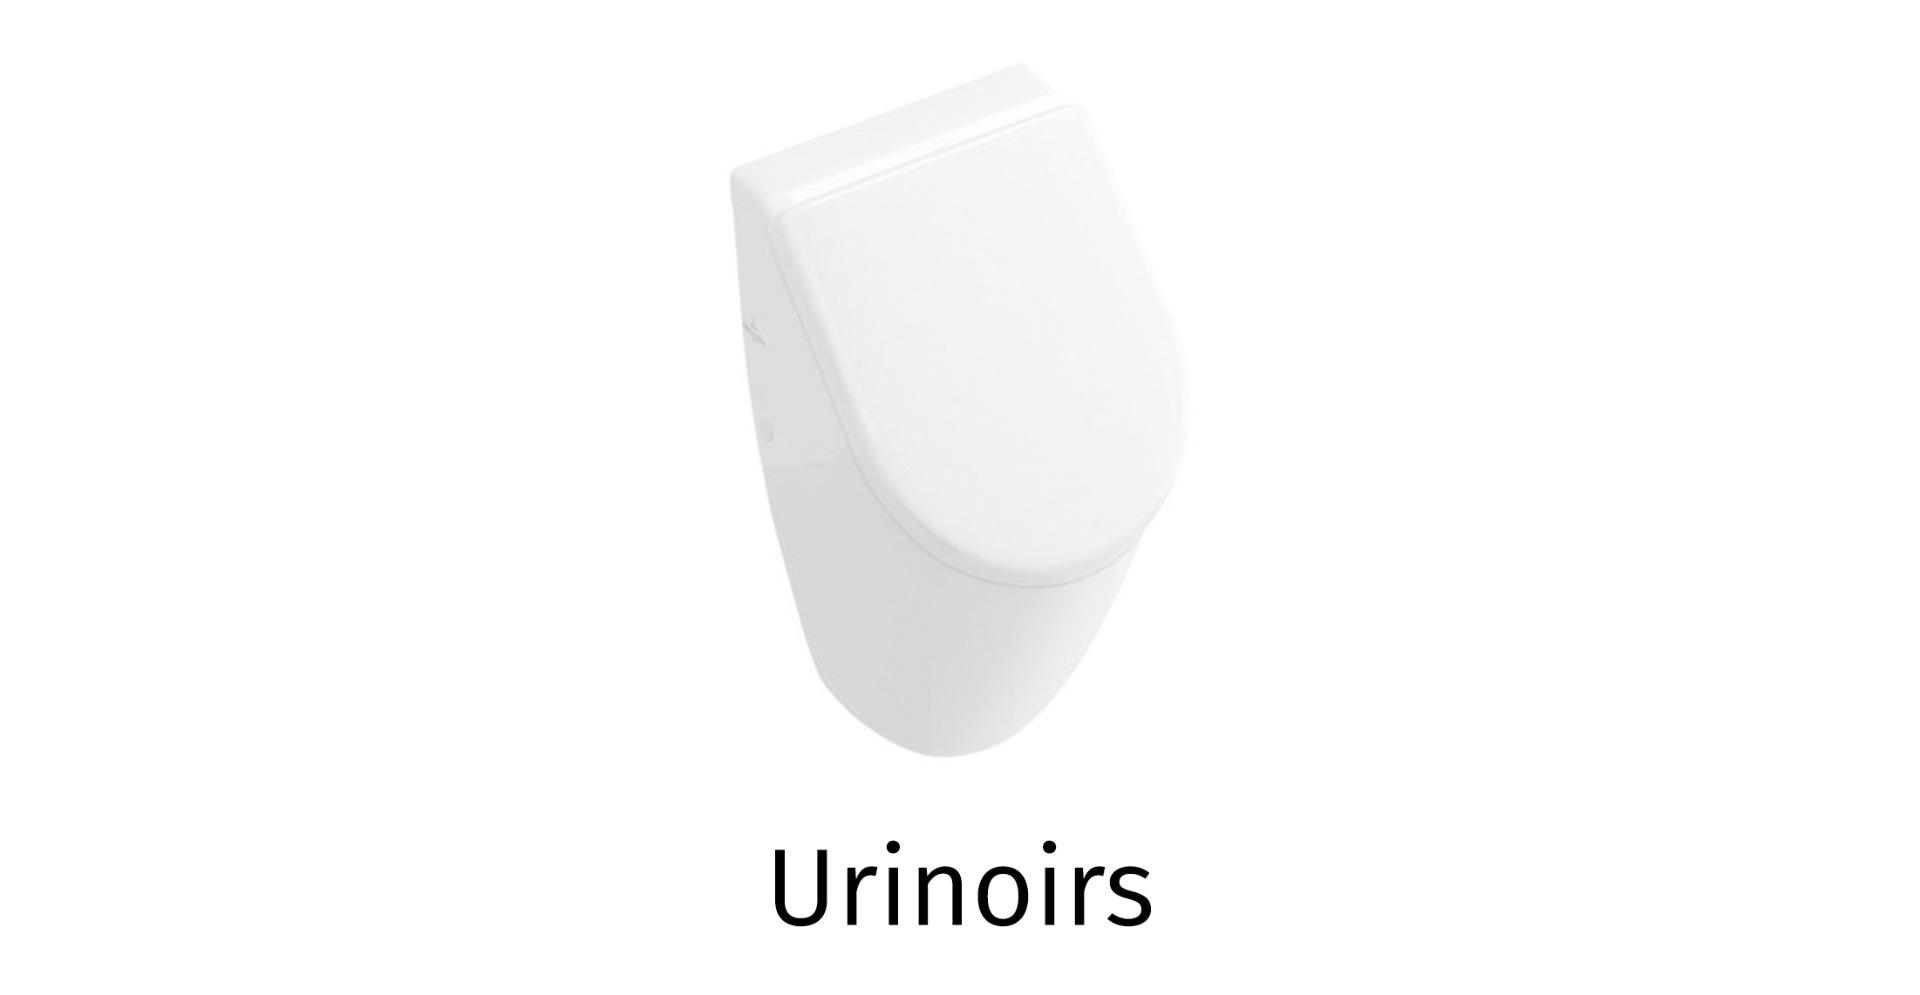 Urinoirs